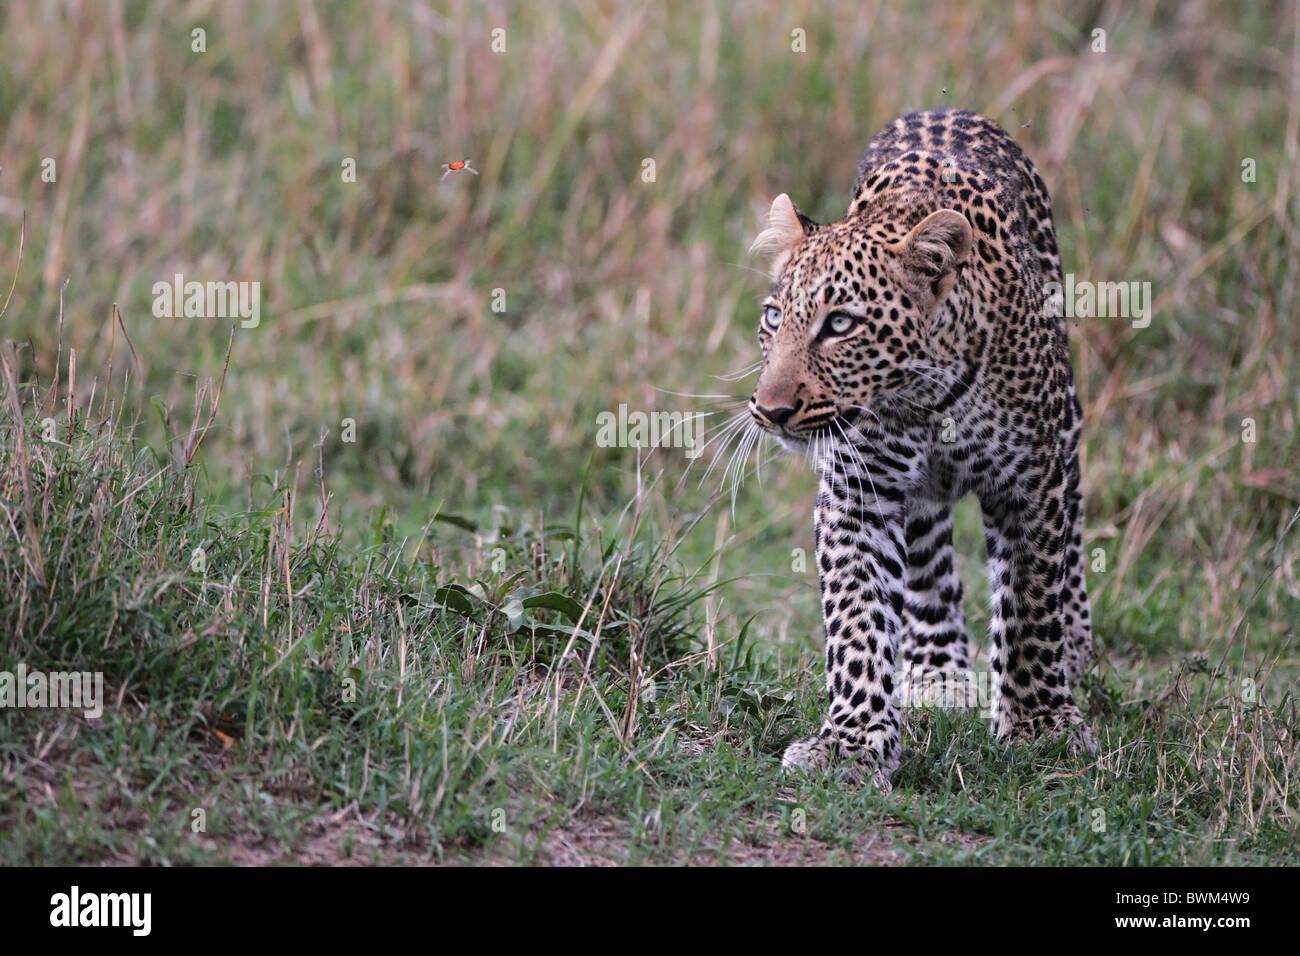 Leopard walking through higher grass, Masai Mara Game Reserve, Kenya. butterfly, looking-up, watching, lustig, komisch Stock Photo